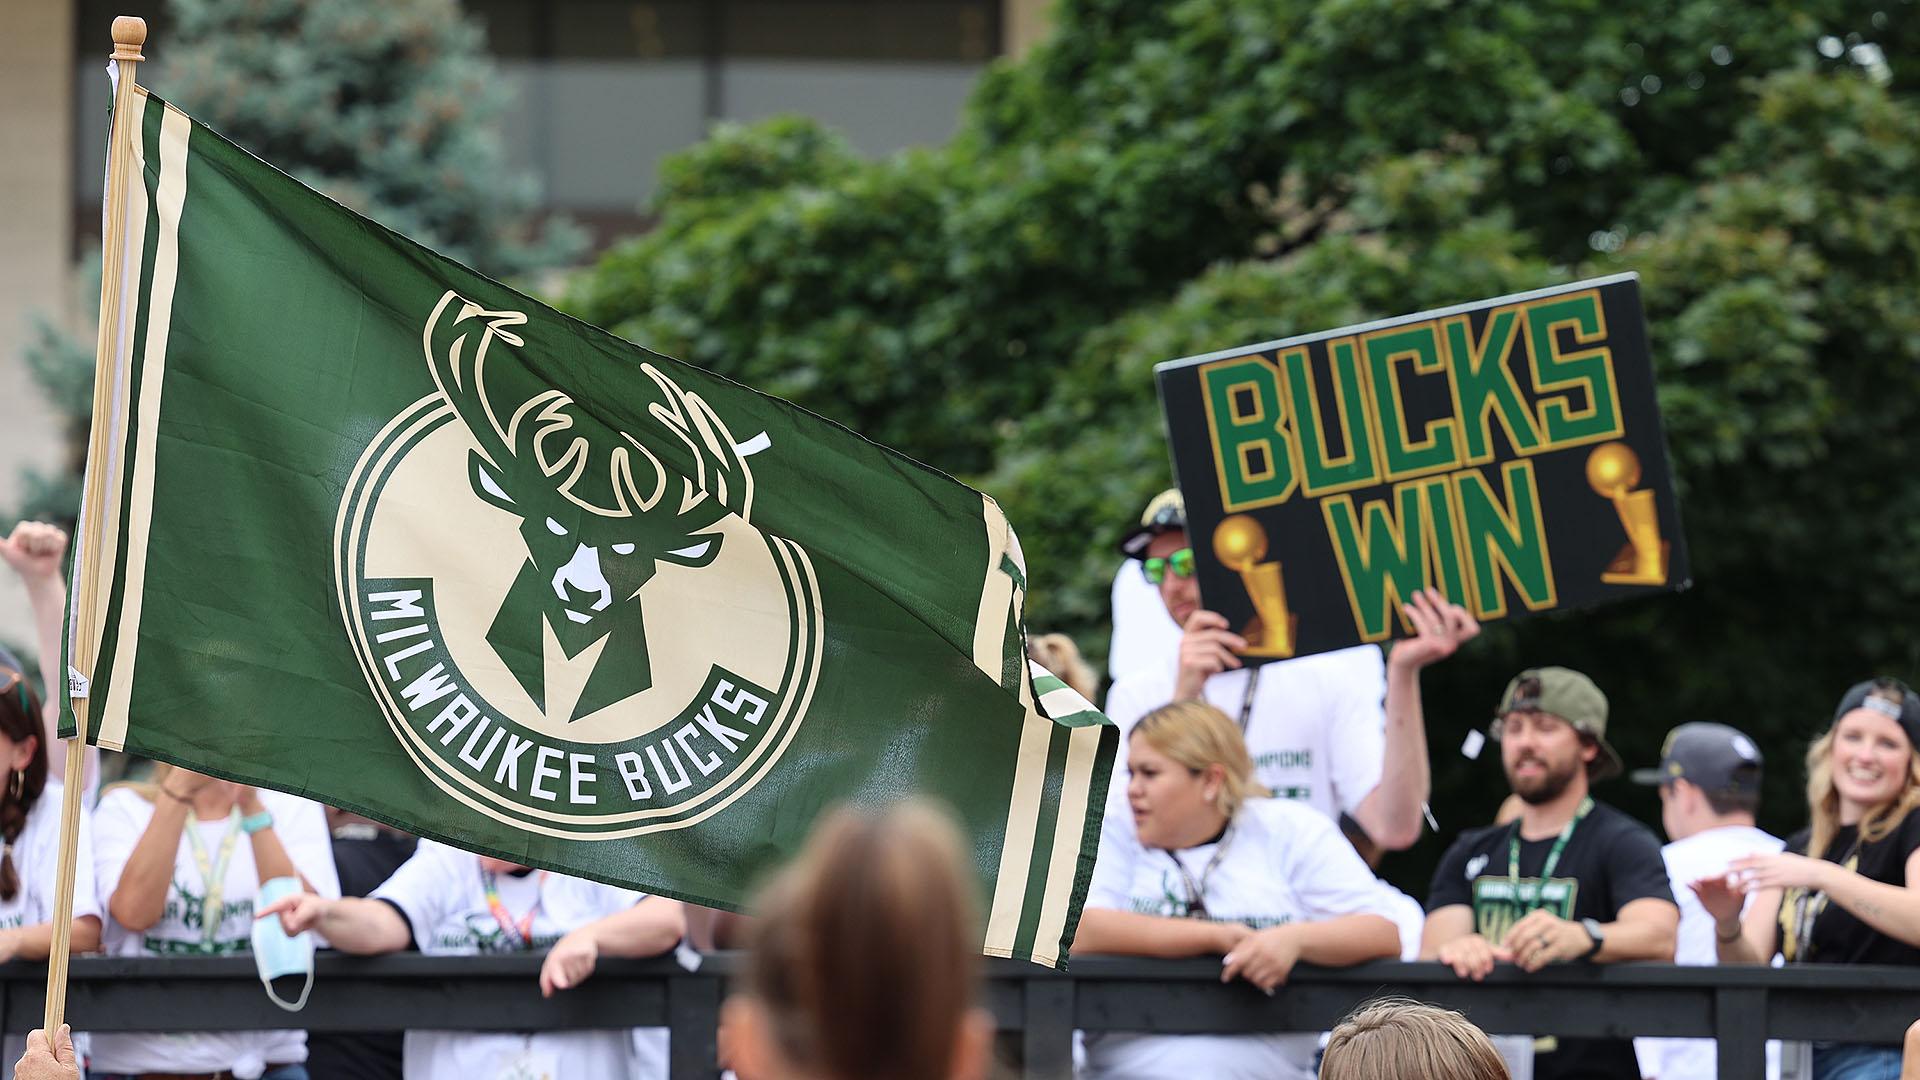 Bucks fans bask in team's first title since 1971